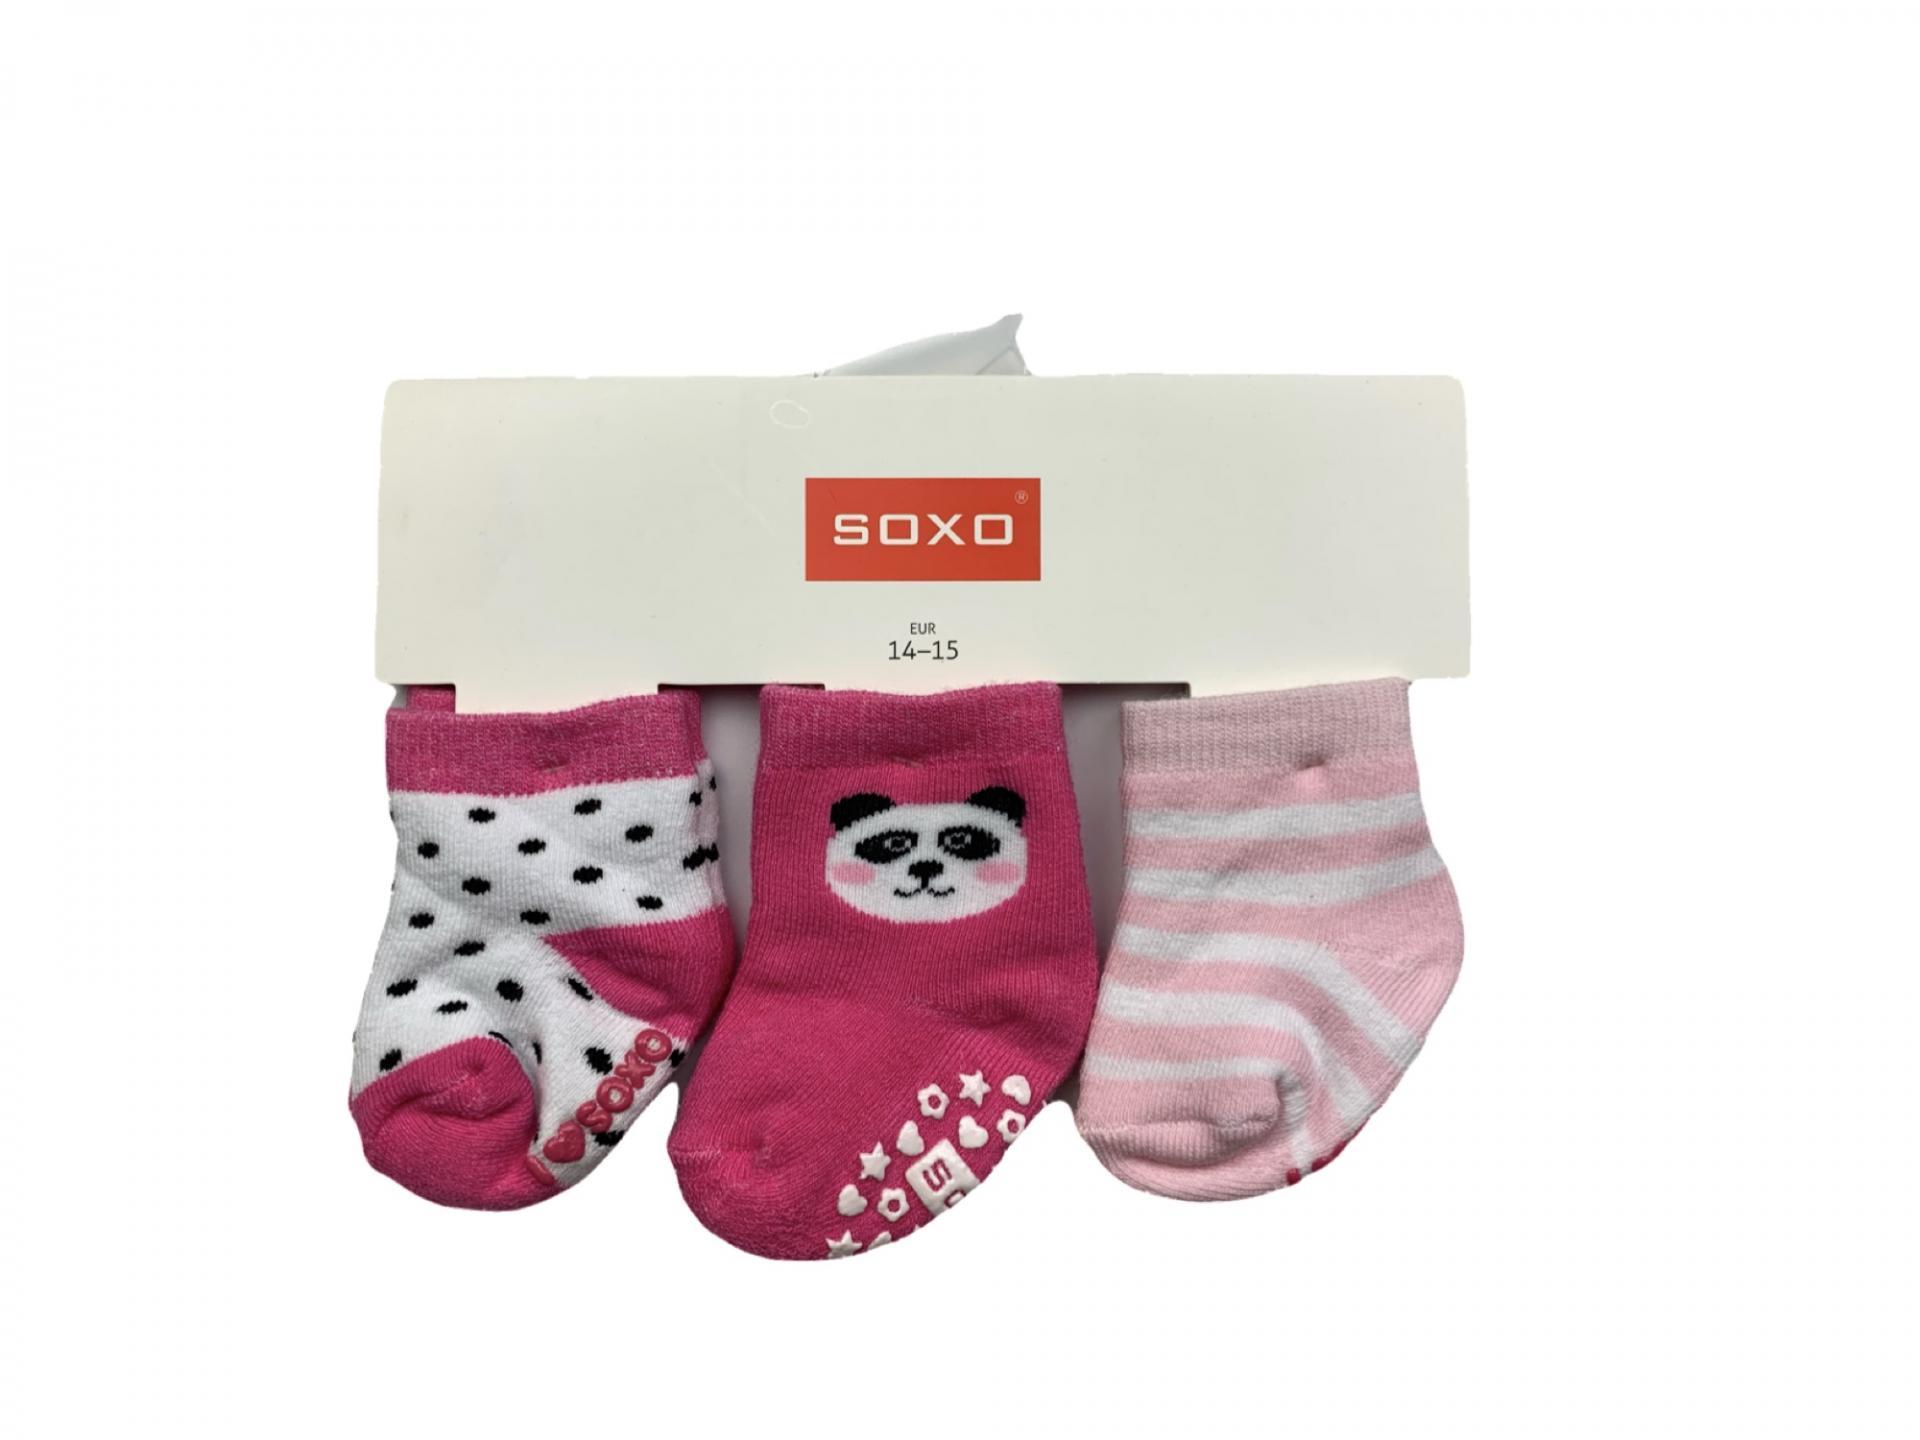 Pack de 3 calcetines antideslizantes rosa